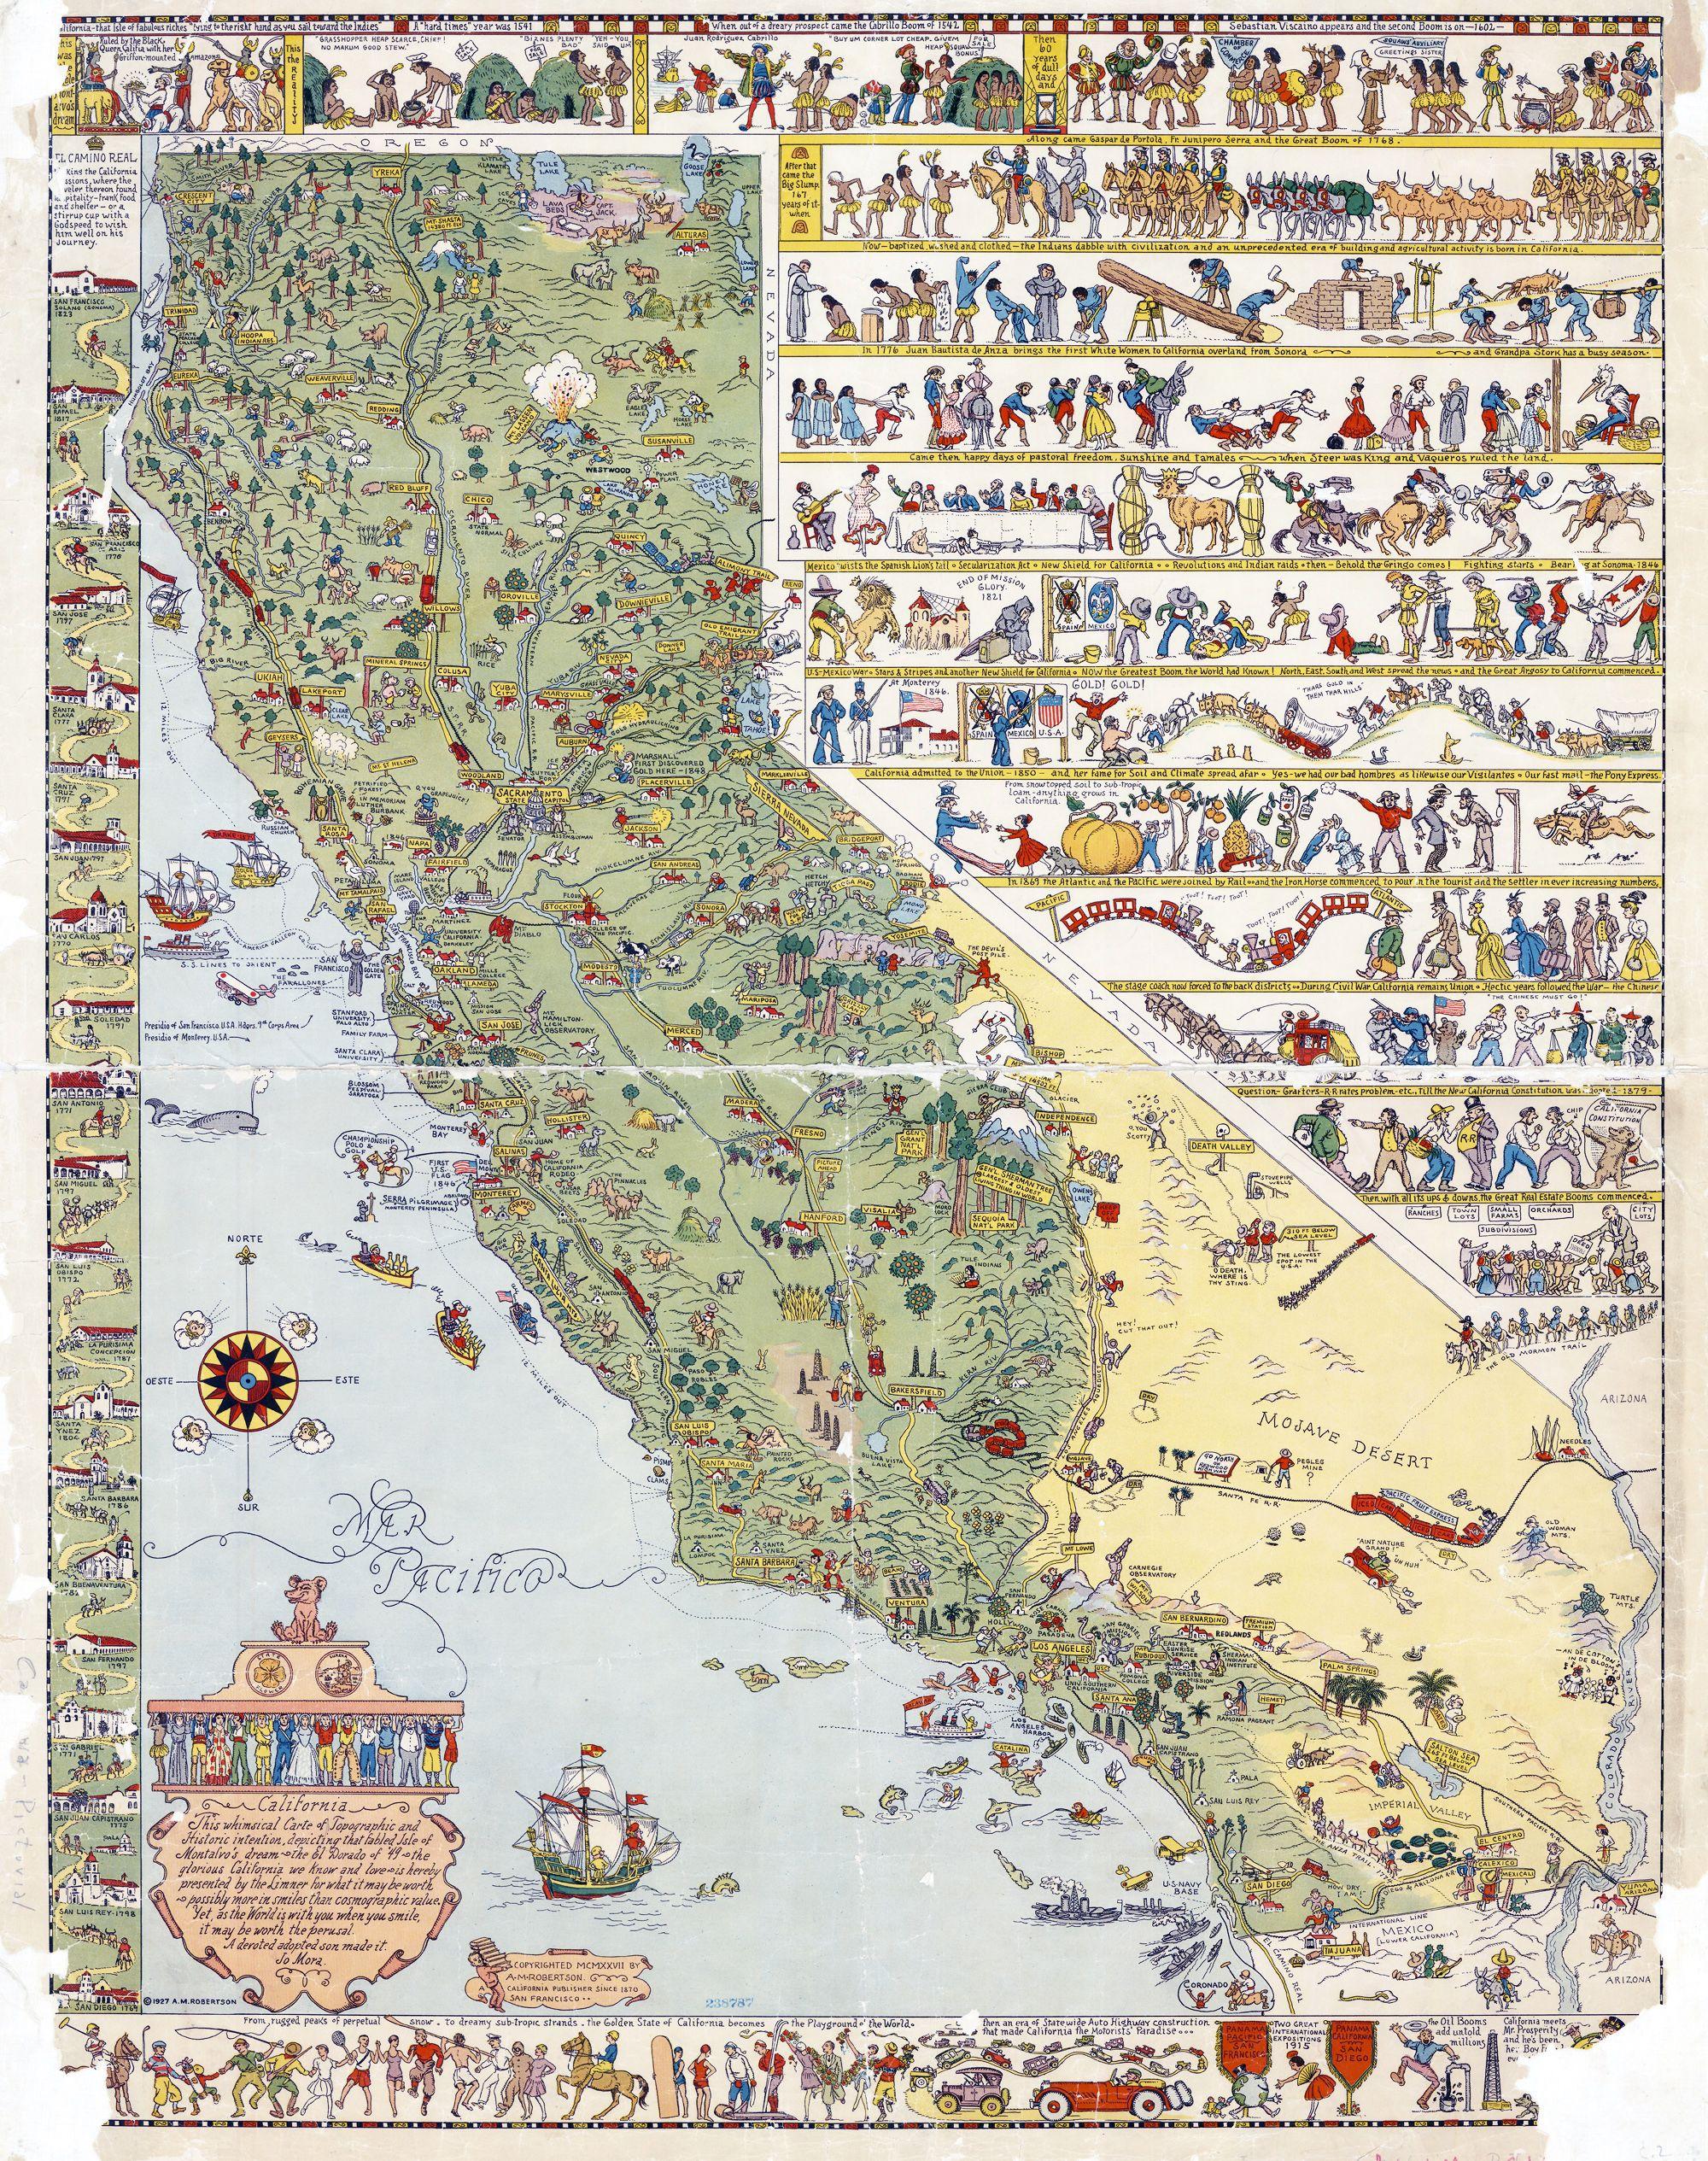 1927 illustrated tourist map of california